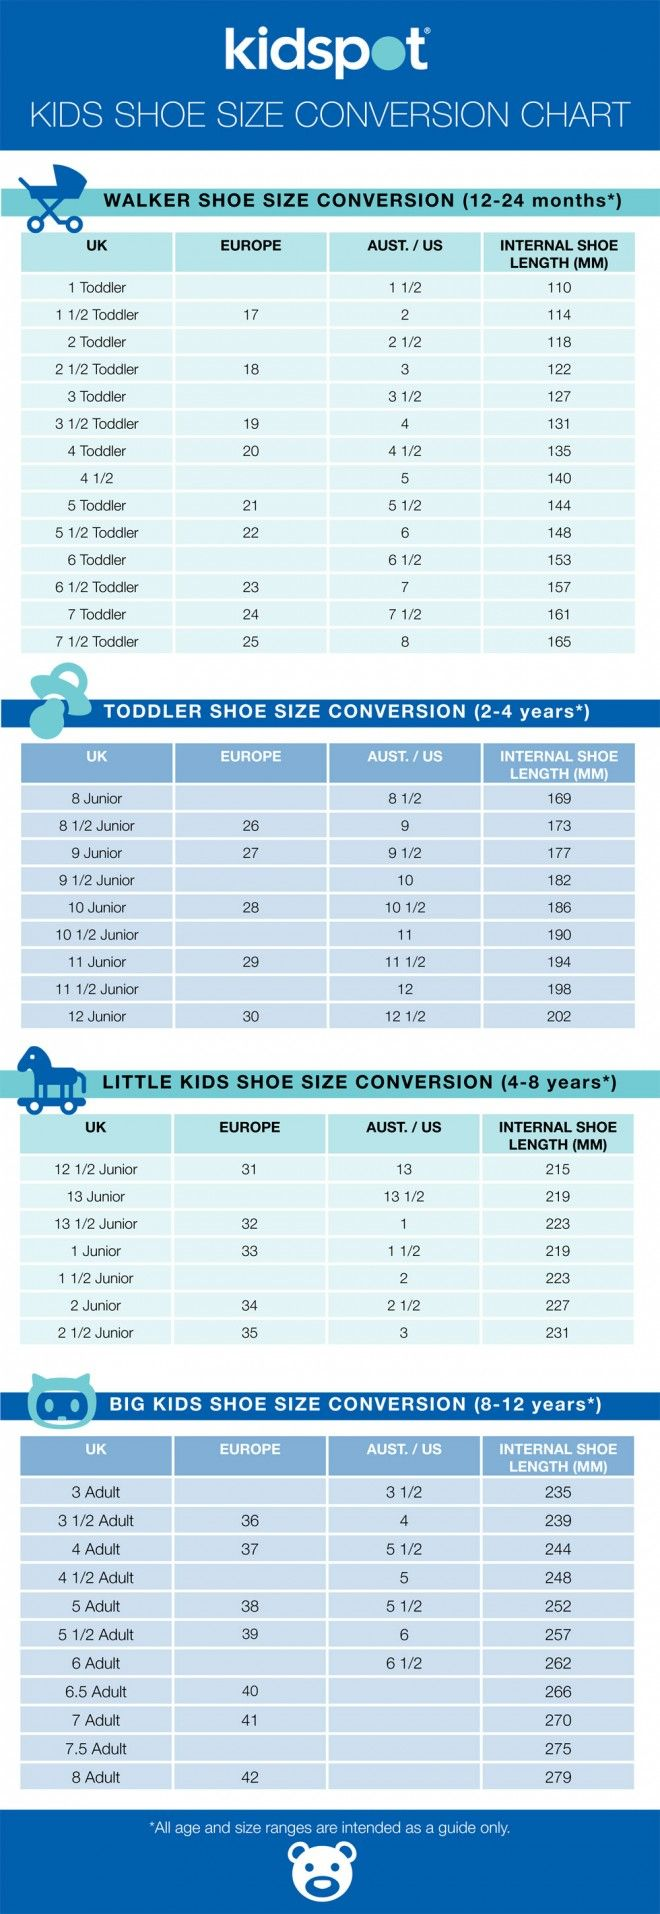 Kids shoe size conversion chart kids childcare pinterest kids shoe size conversion chart nvjuhfo Choice Image